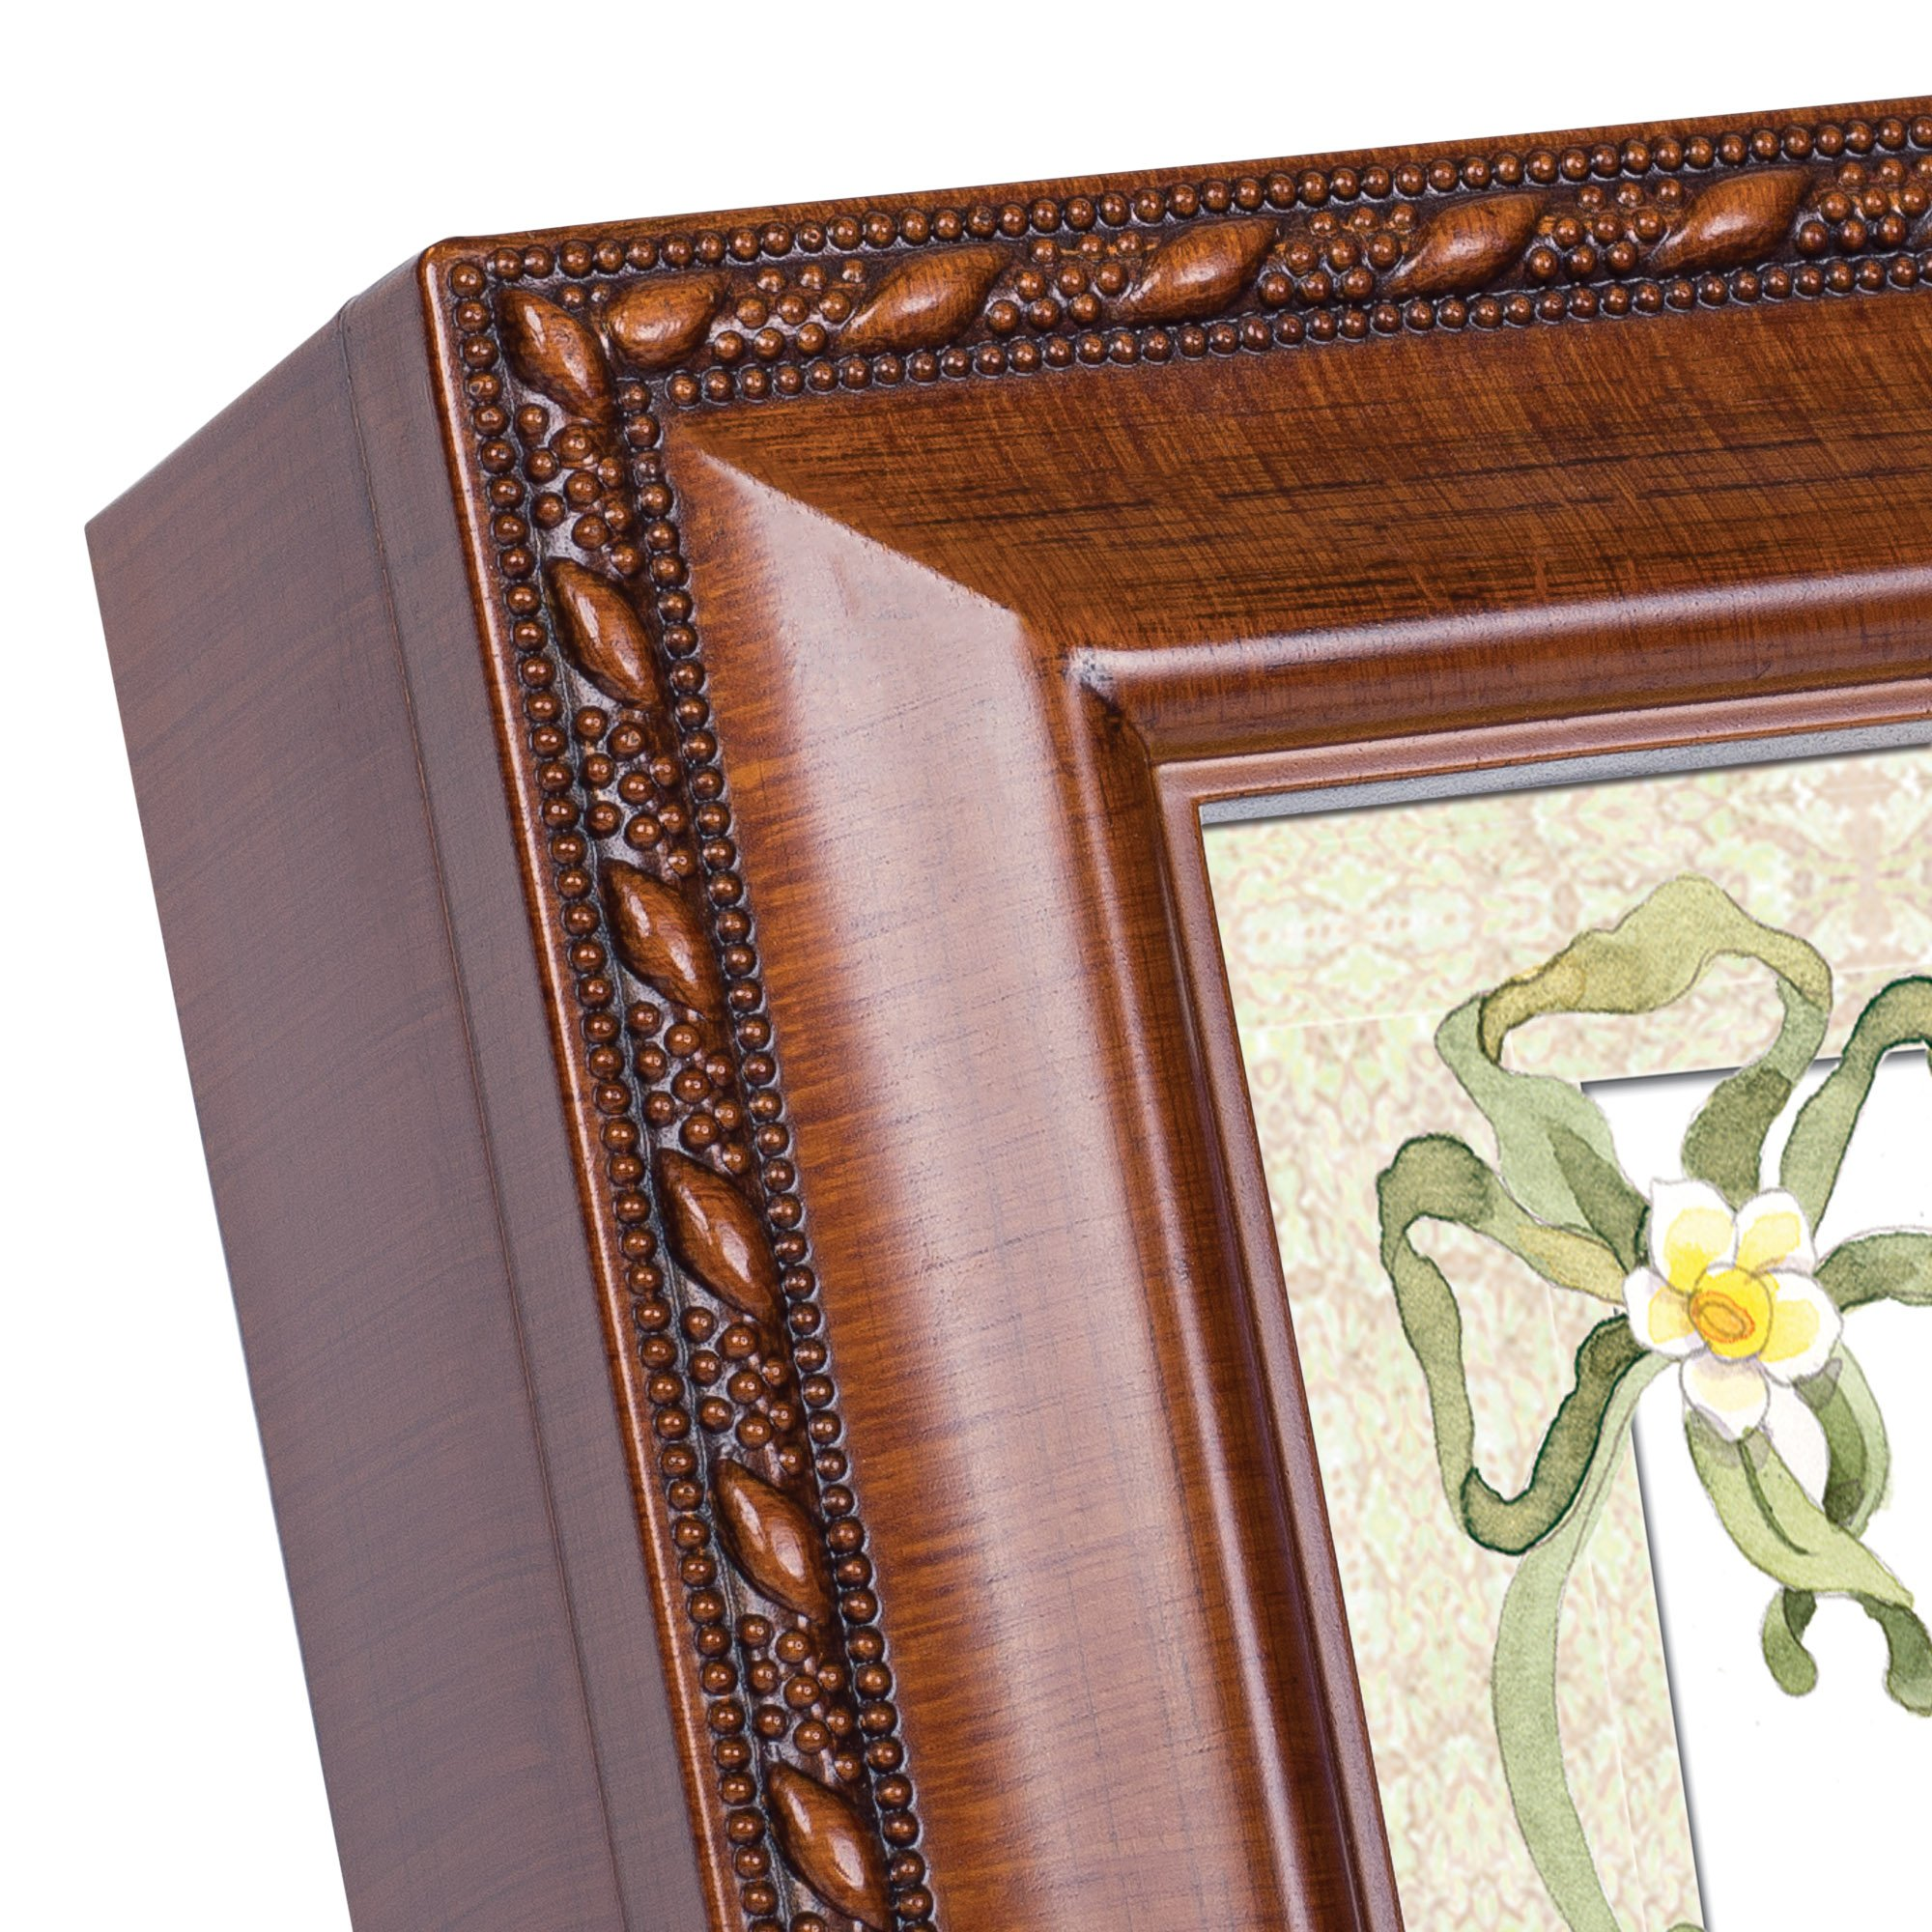 Cottage Garden Dearest Daughter Woodgrain Music Box Plays Light Up My Life by Cottage Garden (Image #2)